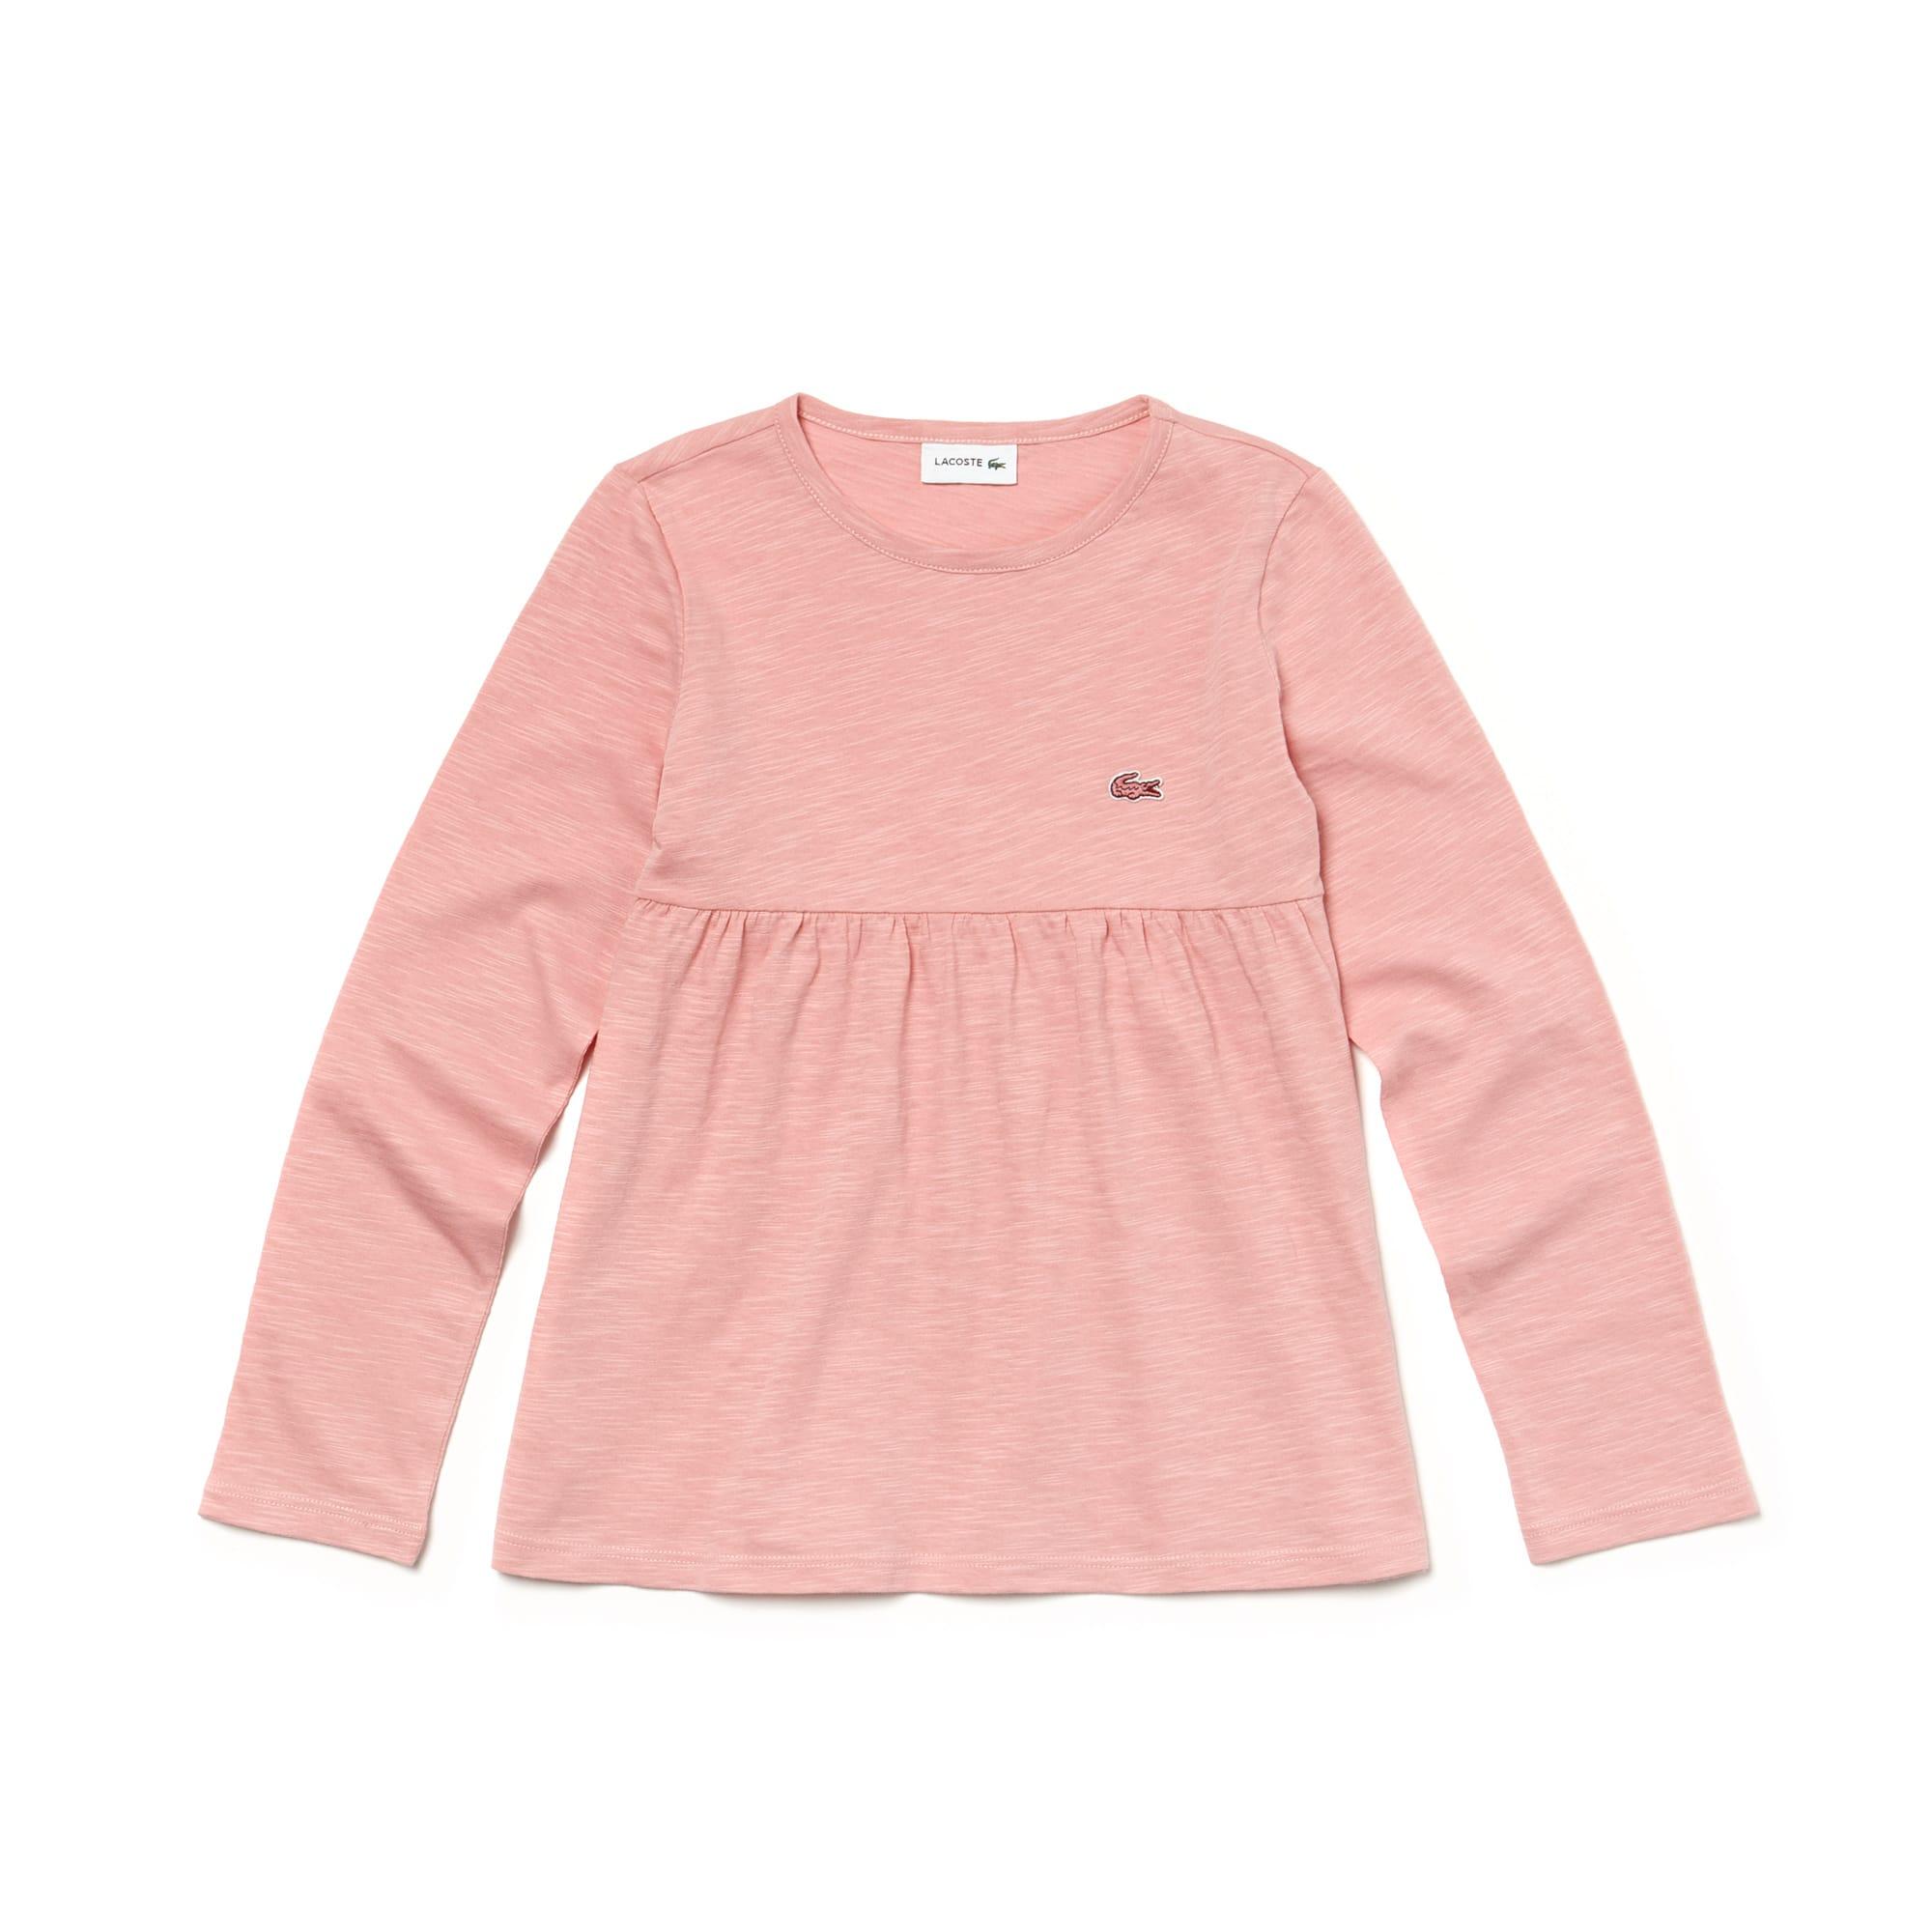 T-shirt Bambina a girocollo con maniche lunghe in jersey di cotone tinta unita